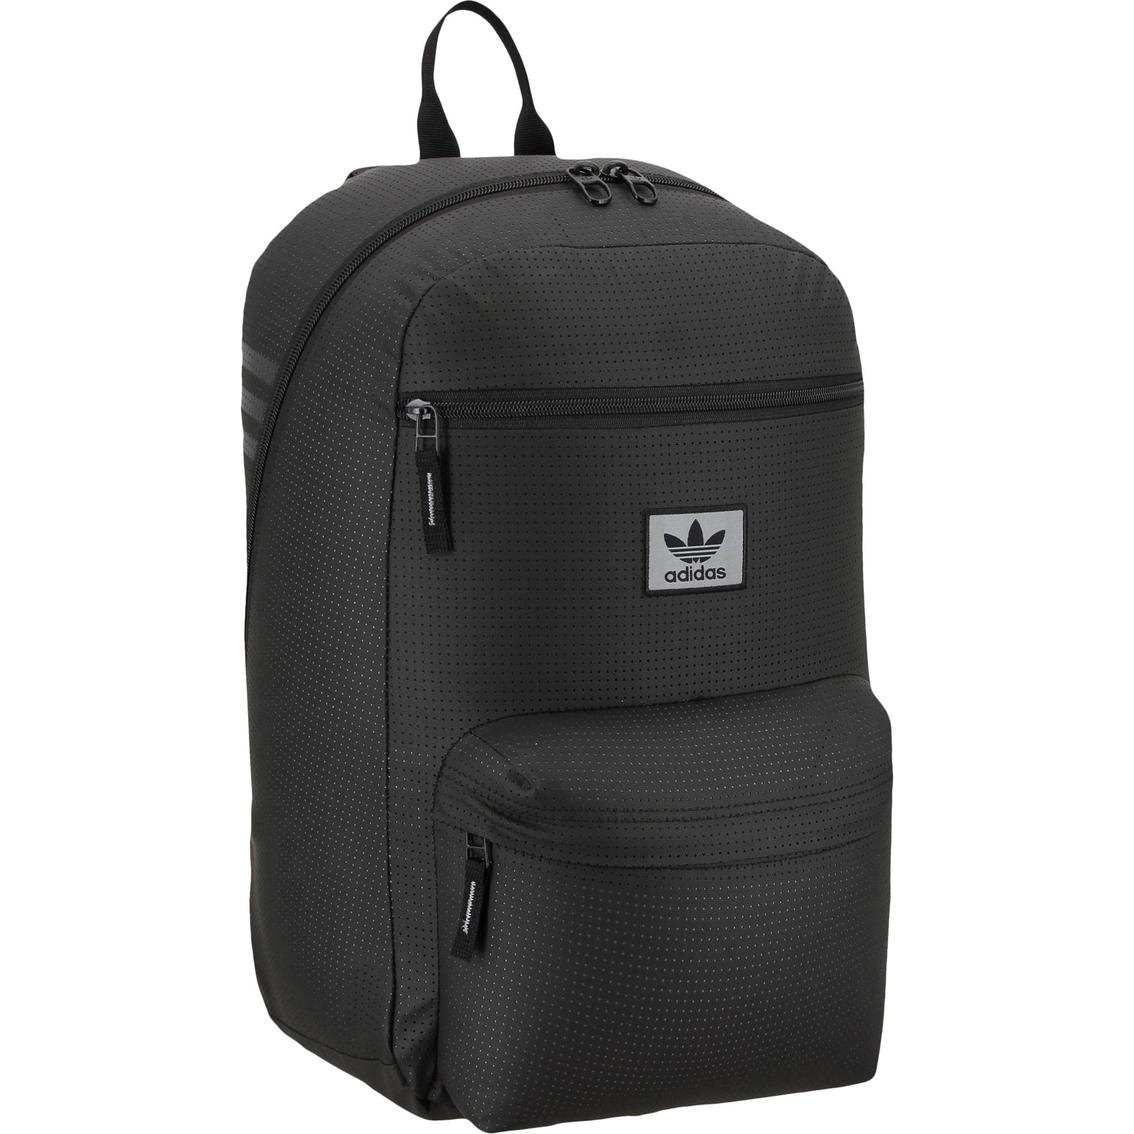 4bb726dc7281 Adidas Originals National Plus Backpack